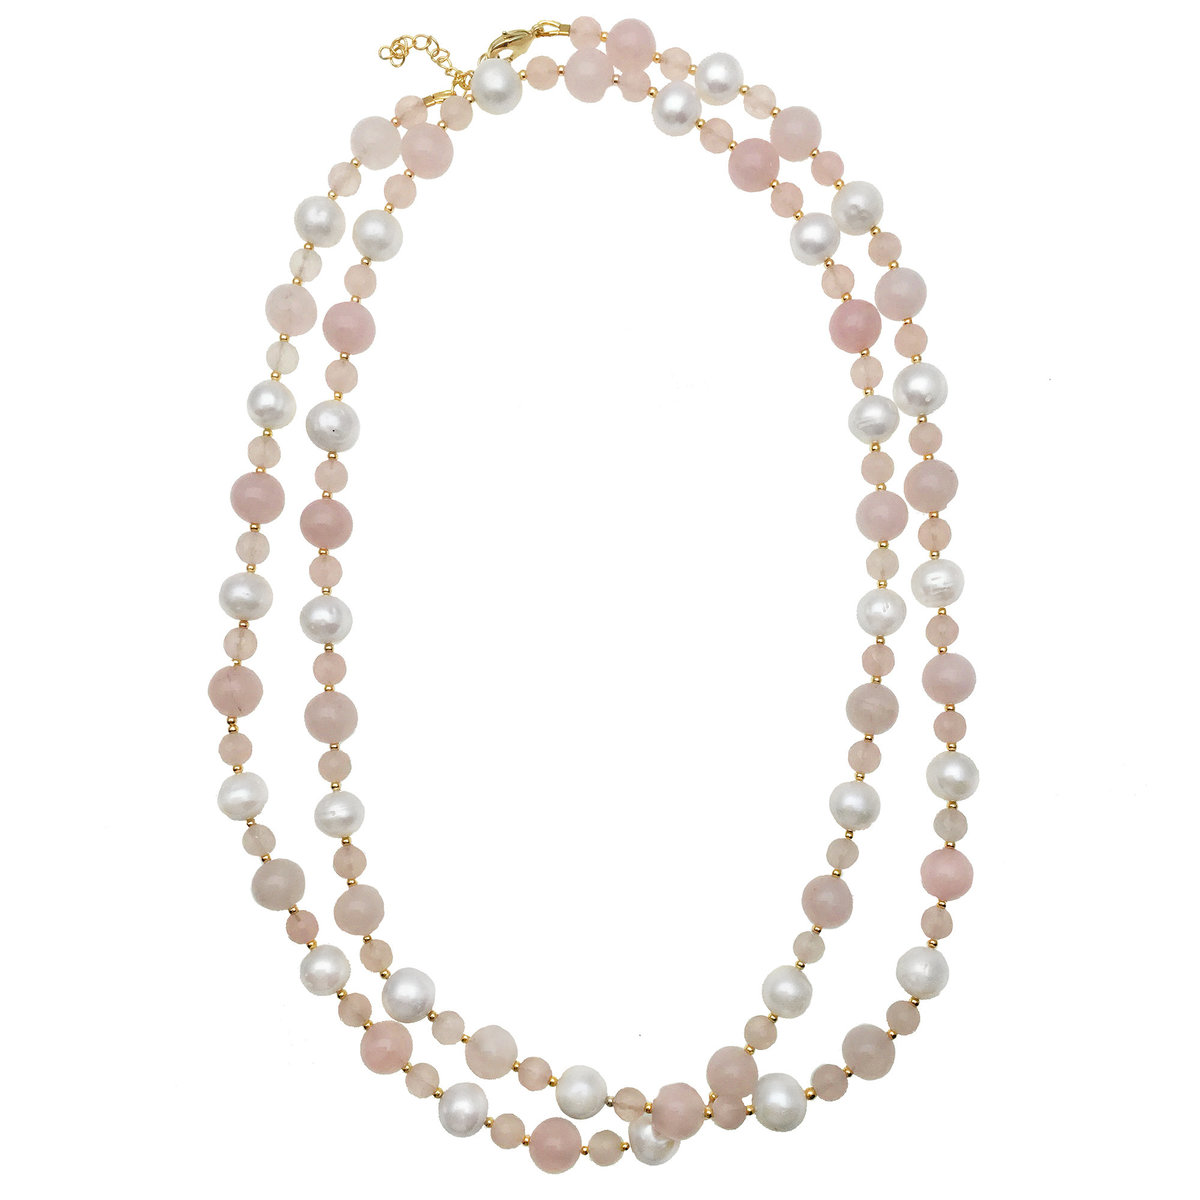 Freshwater Pearls & Rose Quartz Multi-Way Necklace